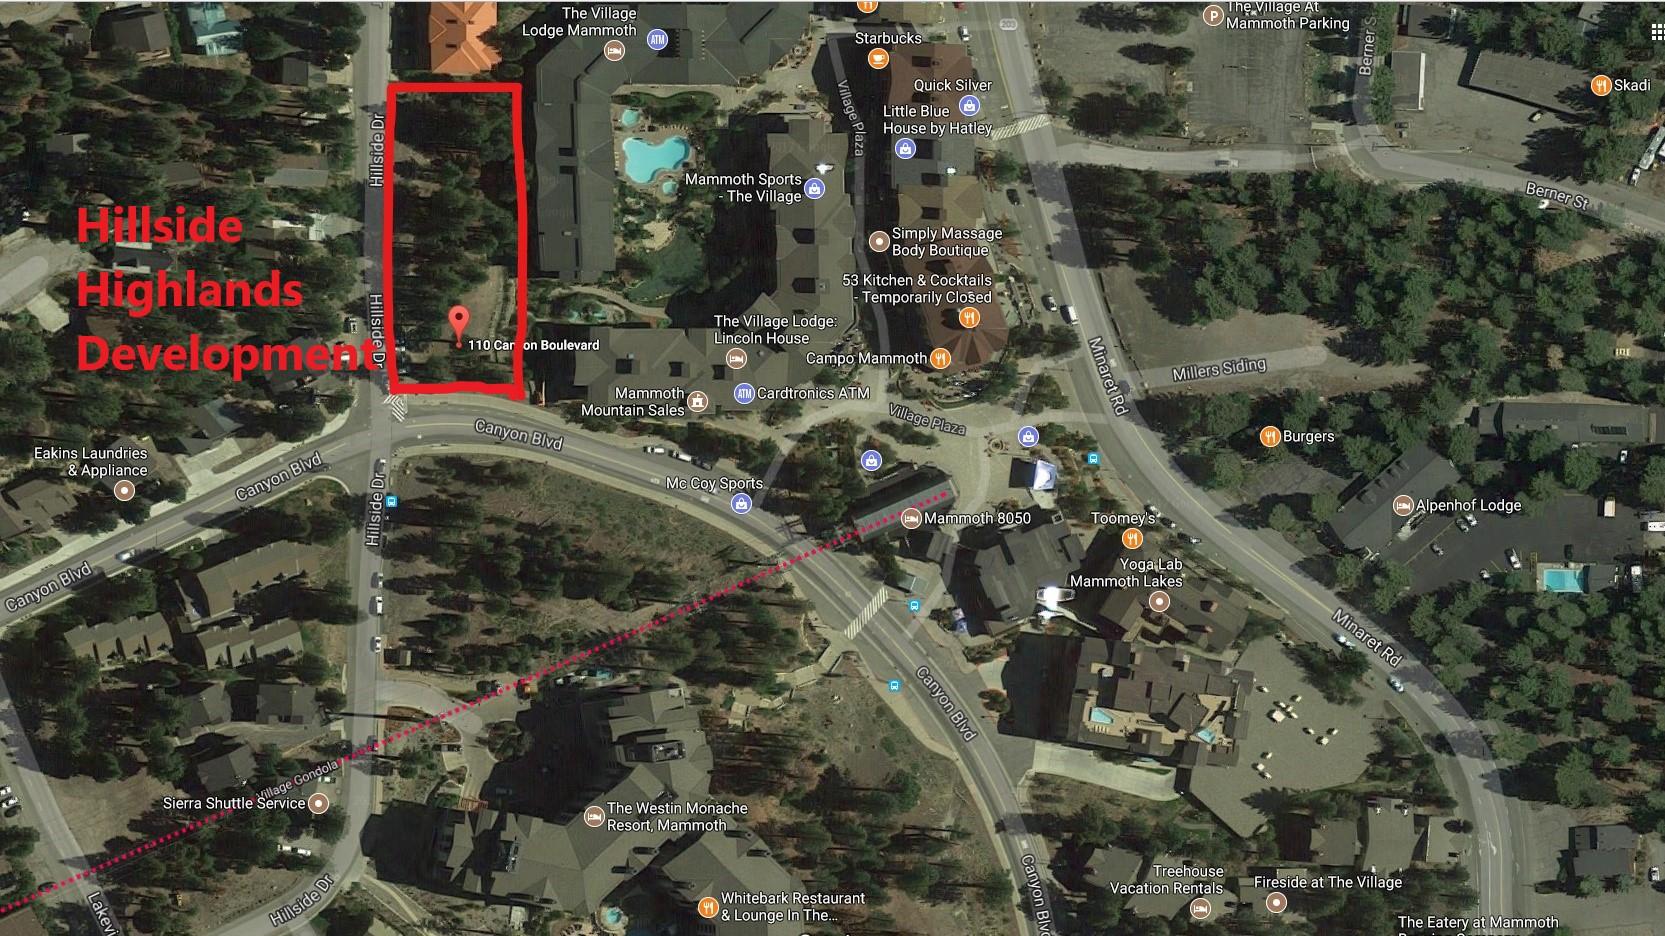 Aerial Photo of Hillside Highlands Development